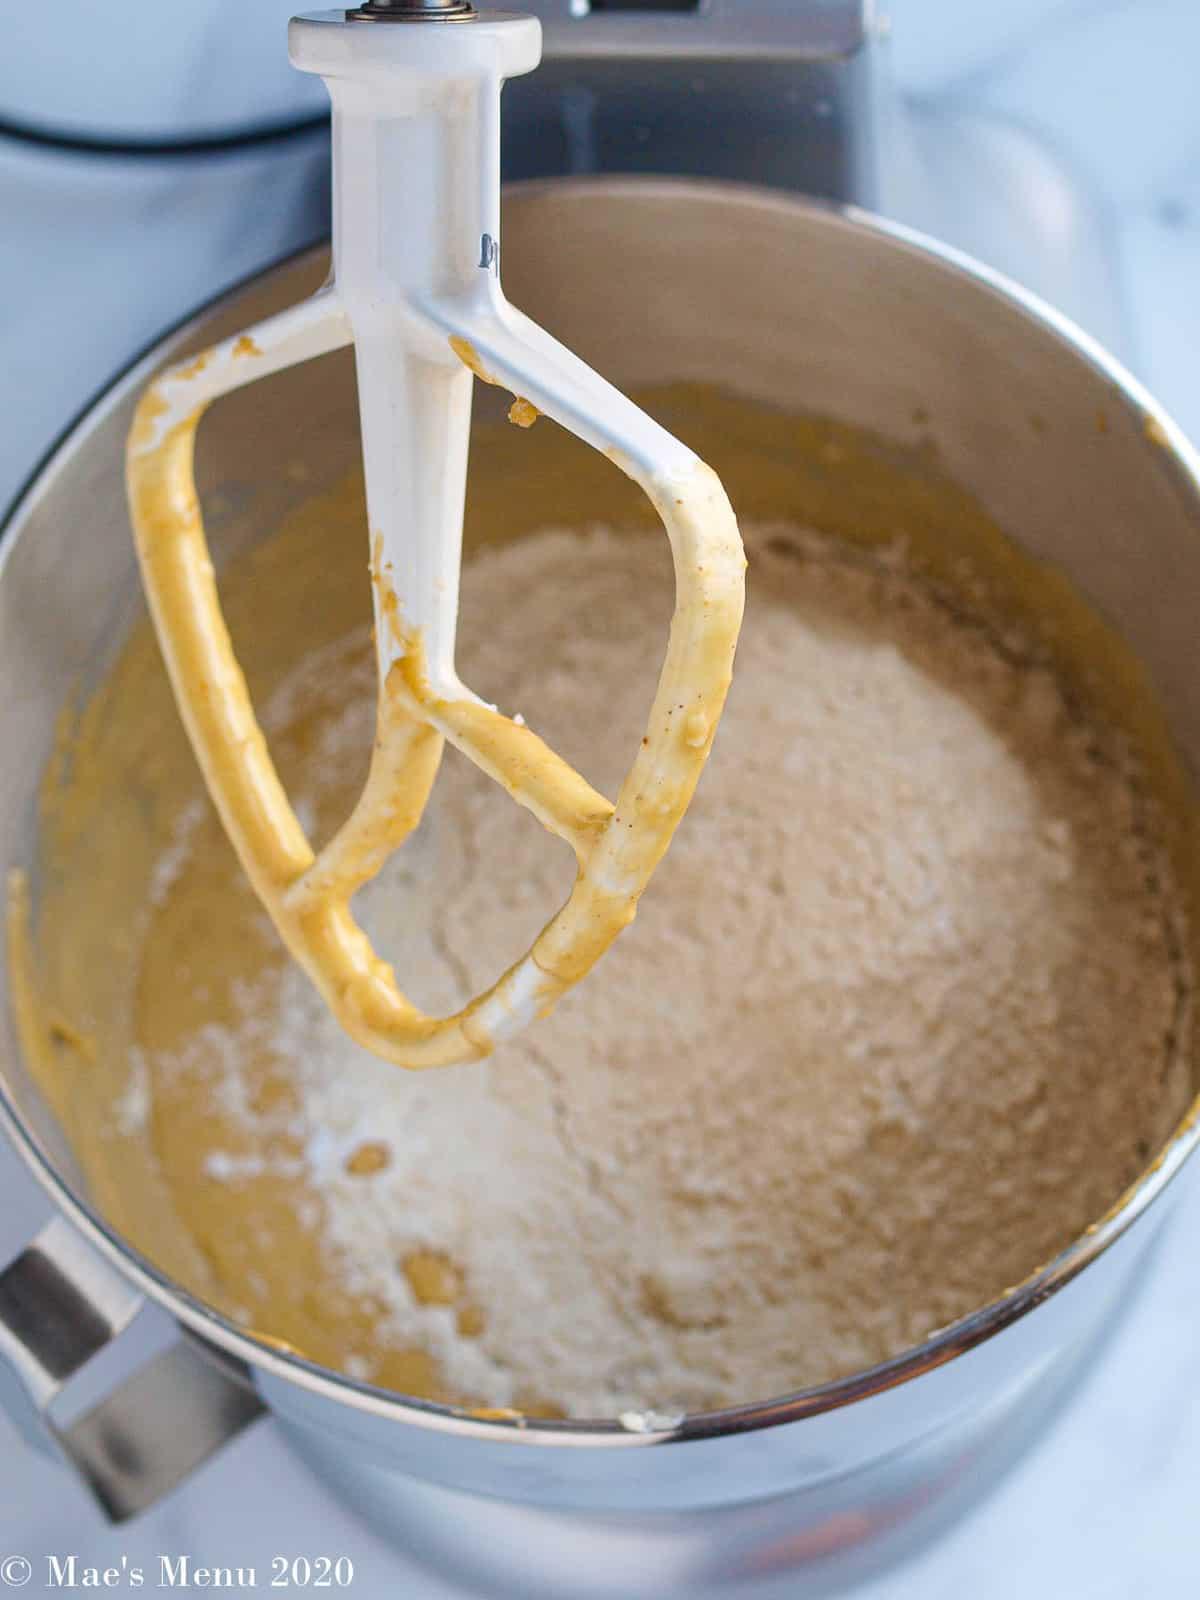 Adding white whole wheat flour to the bowl of batter